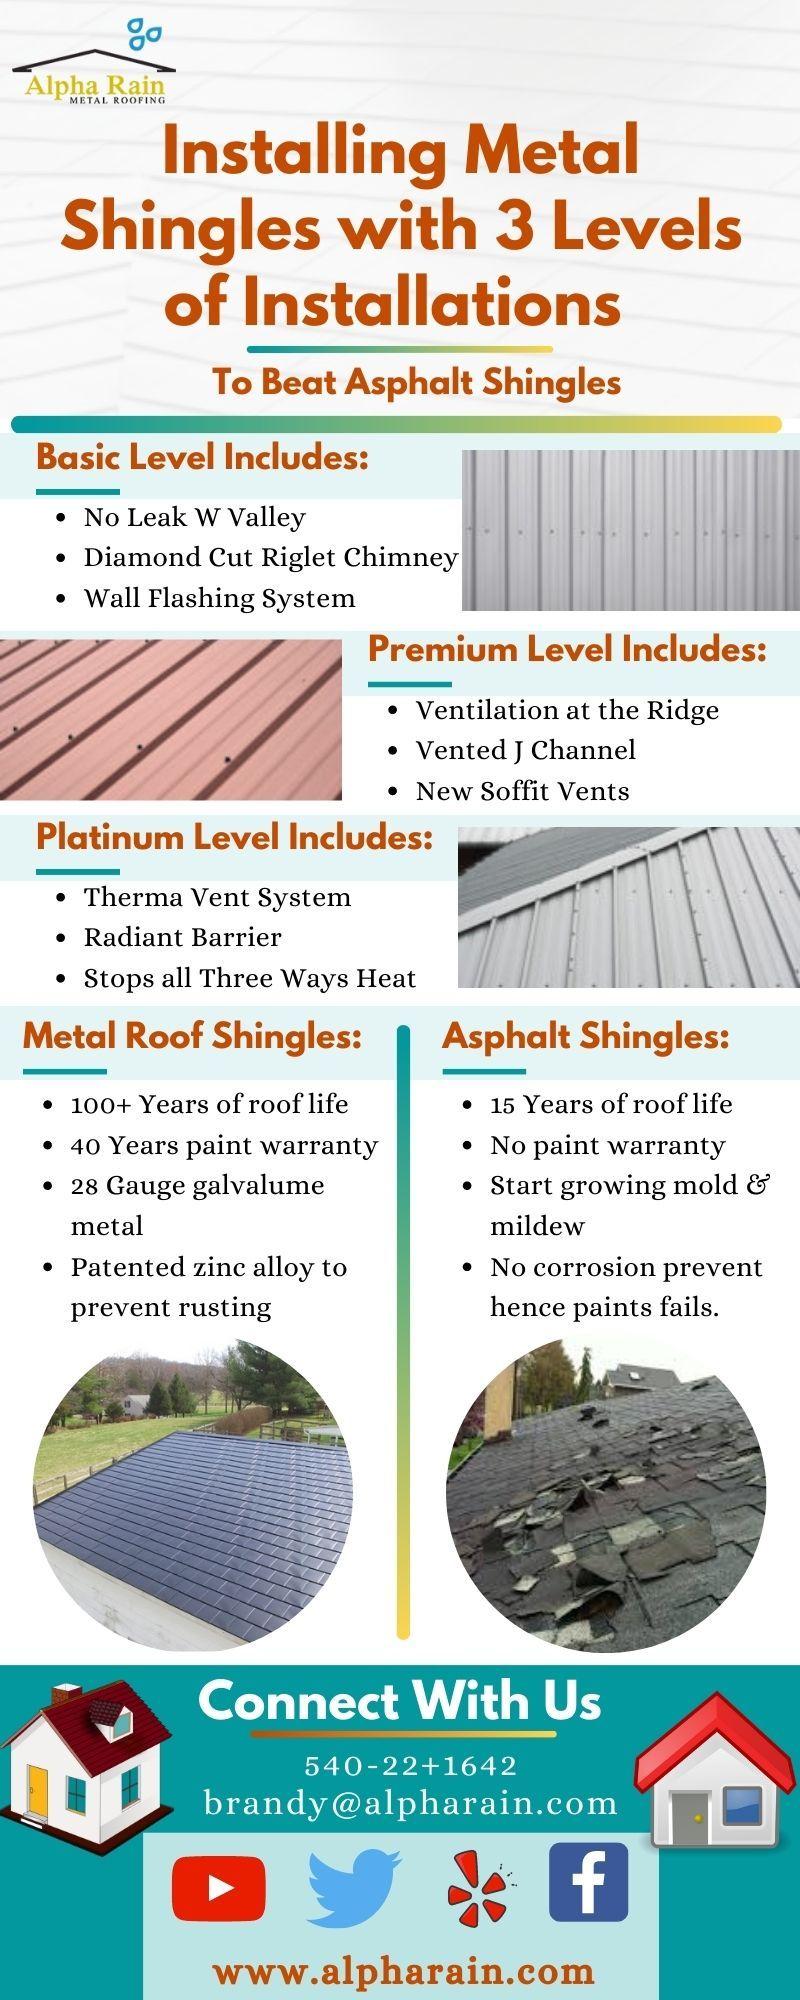 Metal Roof Shingles At A Price Of Regular Asphalt Shingles In 2020 Metal Shingle Roof Metal Roofing Systems Metal Roof